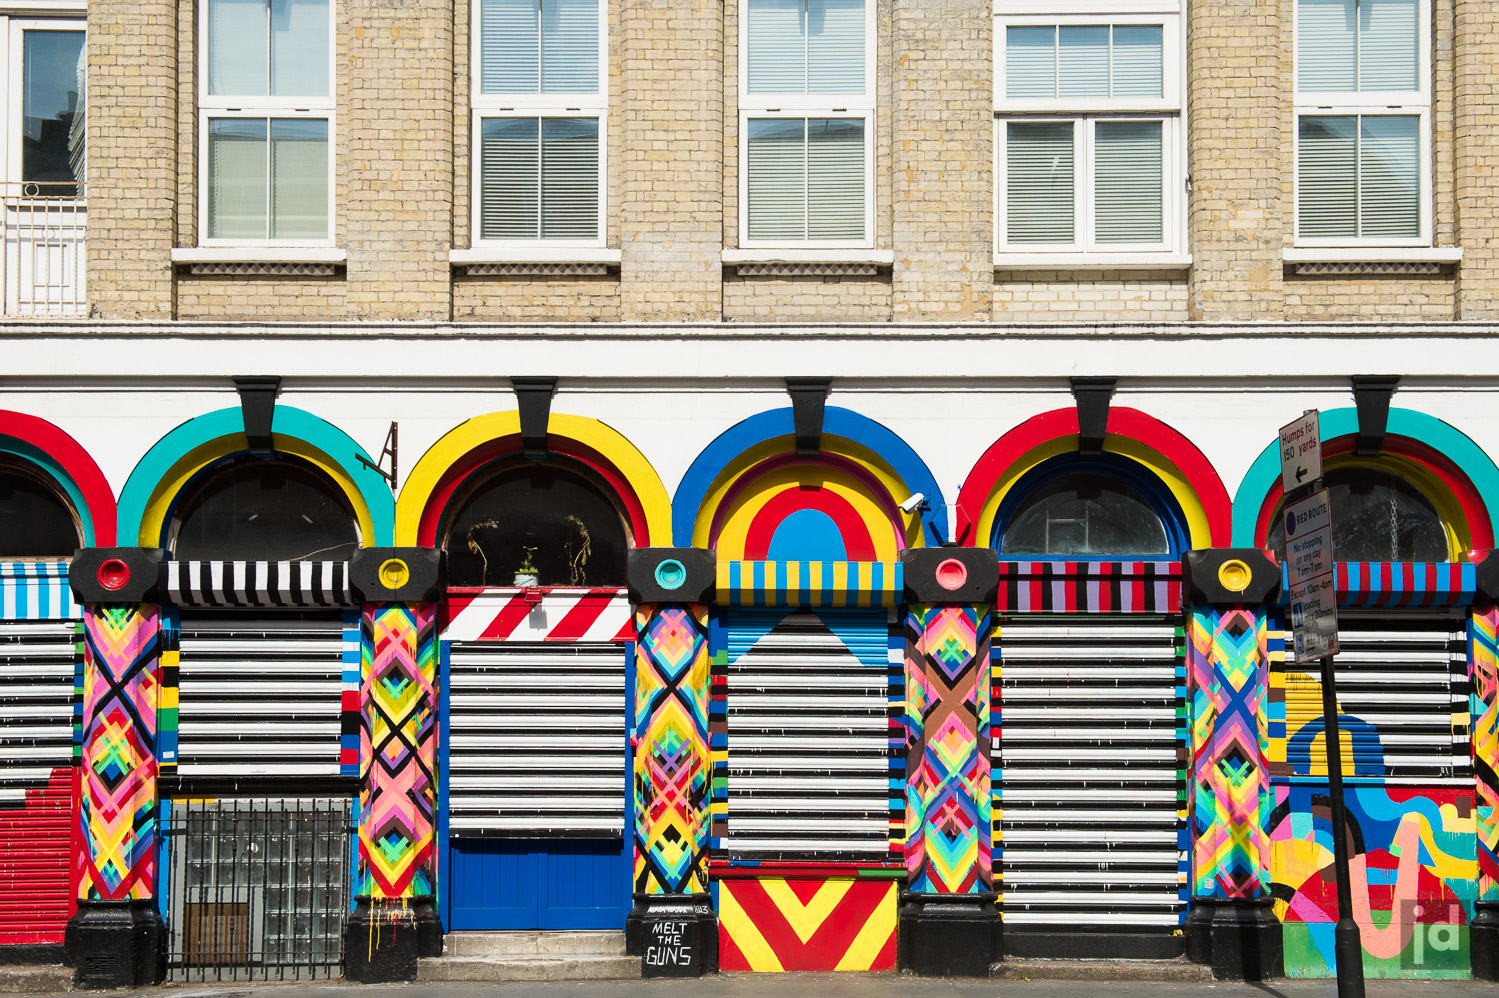 London_Photography_Jason_Davis_Images_020.jpg